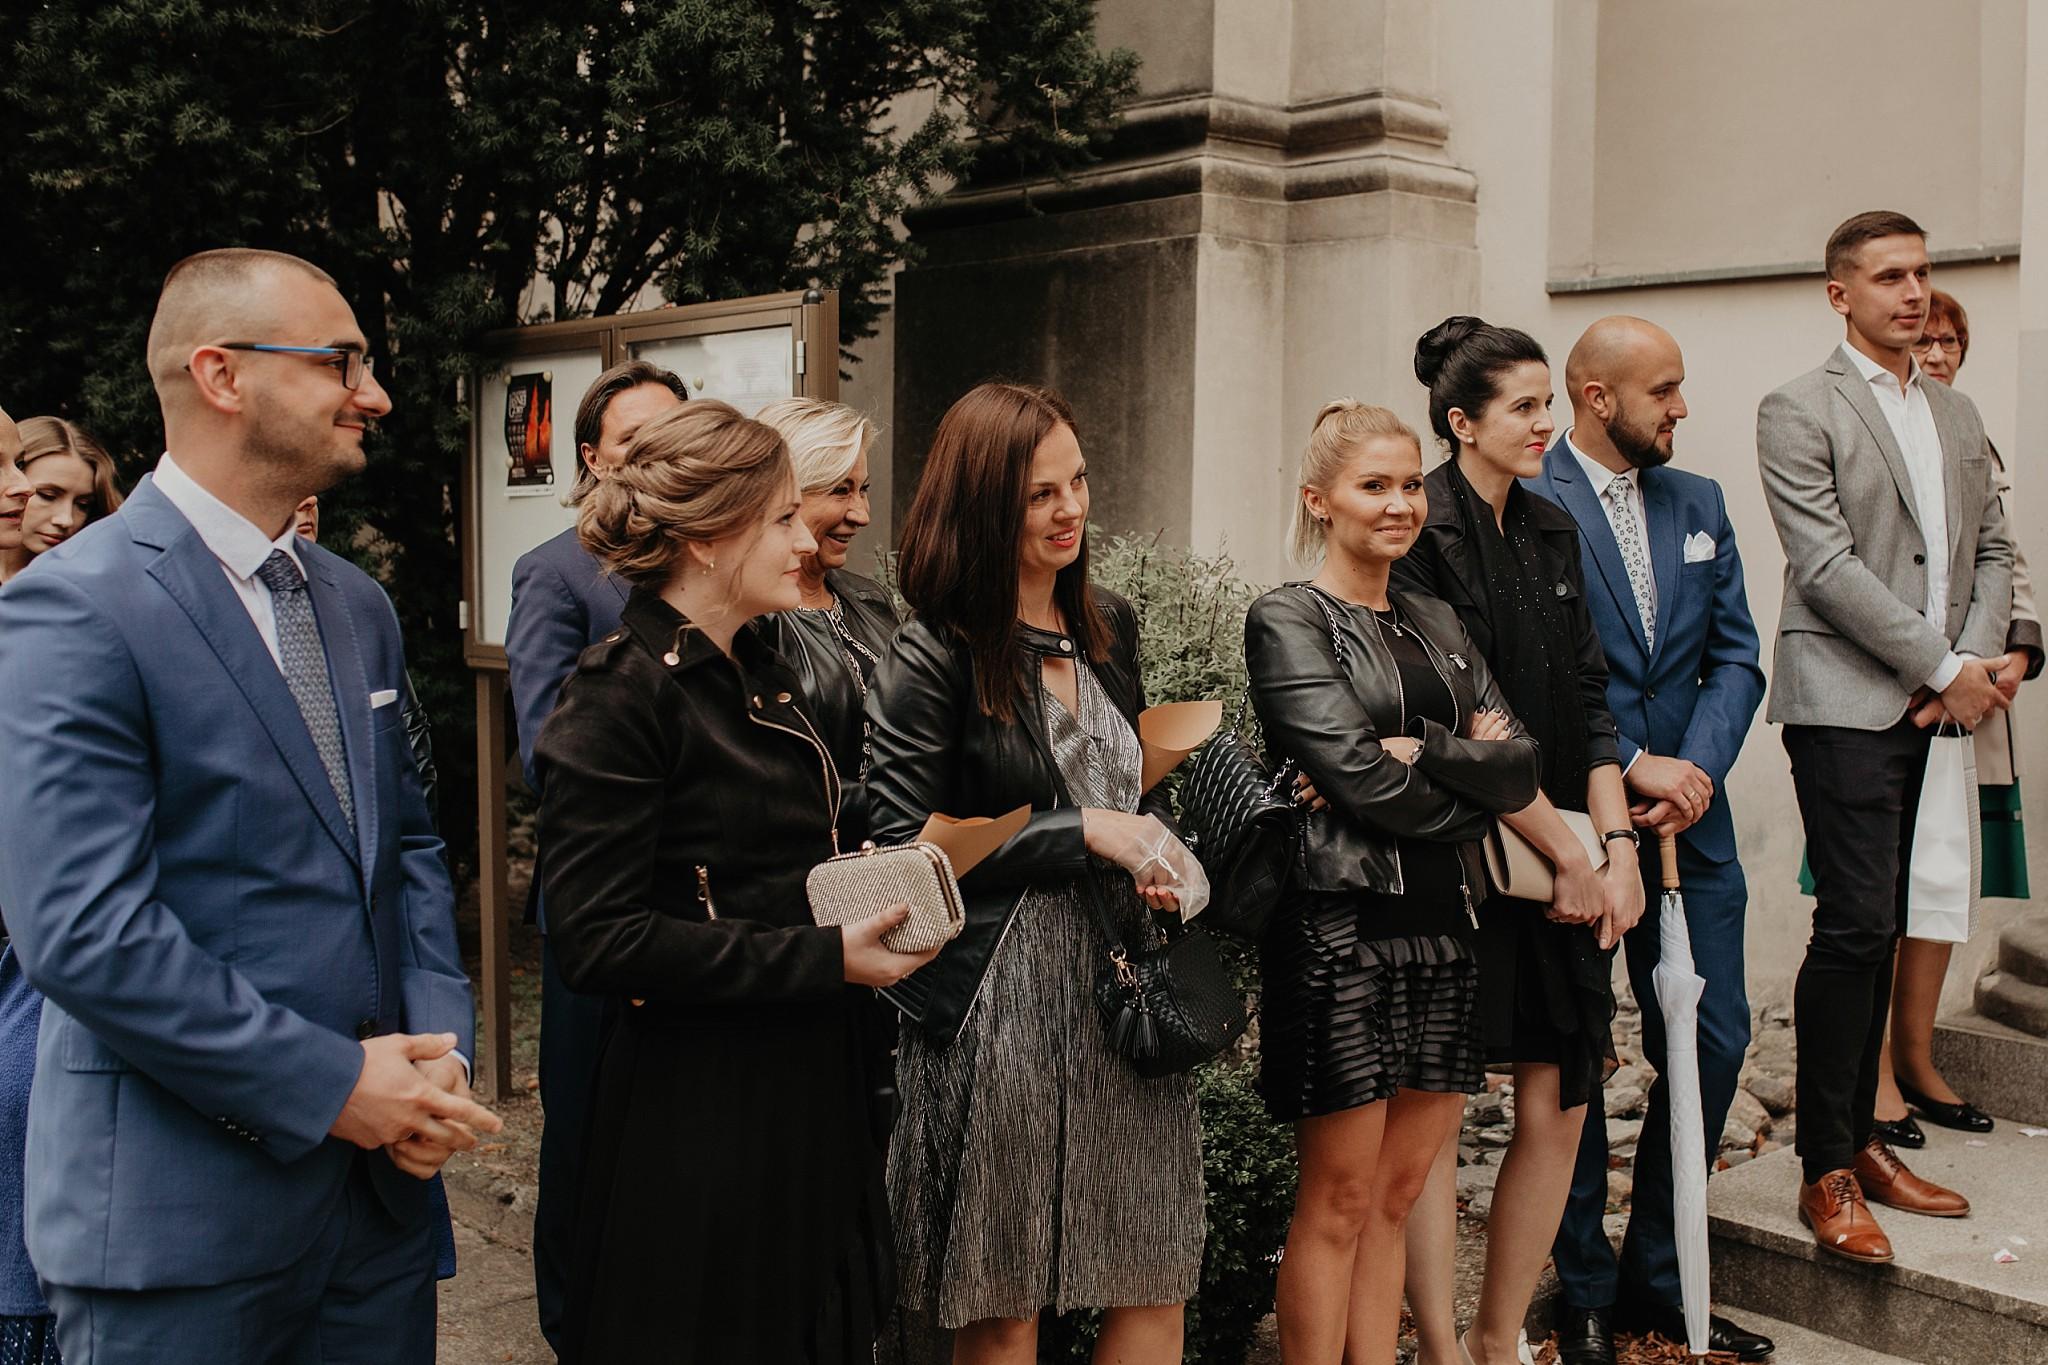 fotograf poznan wesele dobra truskawka piekne wesele pod poznaniem wesele w dobrej truskawce piekna para mloda slub marzen slub koronawirus slub listopad wesele koronawirus 223